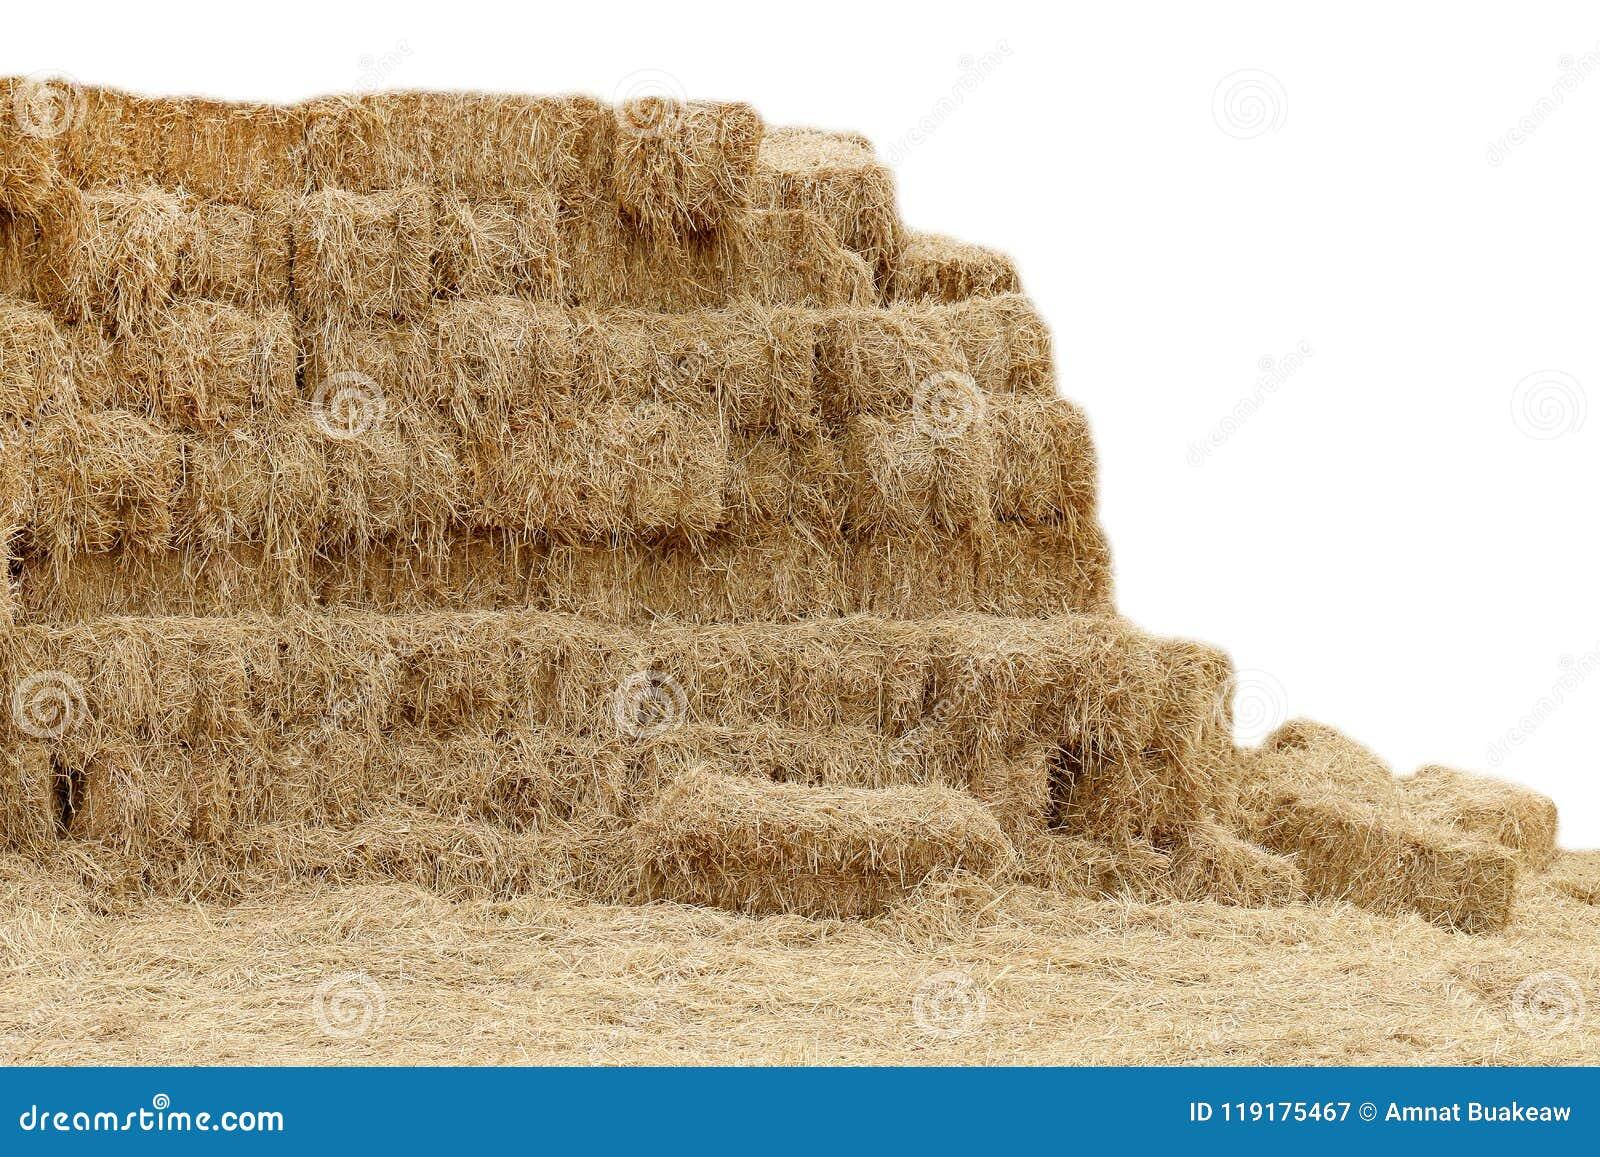 Straw hey, Mountain shape straw hay dry, Straw many on white background, Straw block cube, Hay dry backdrop mountain shape